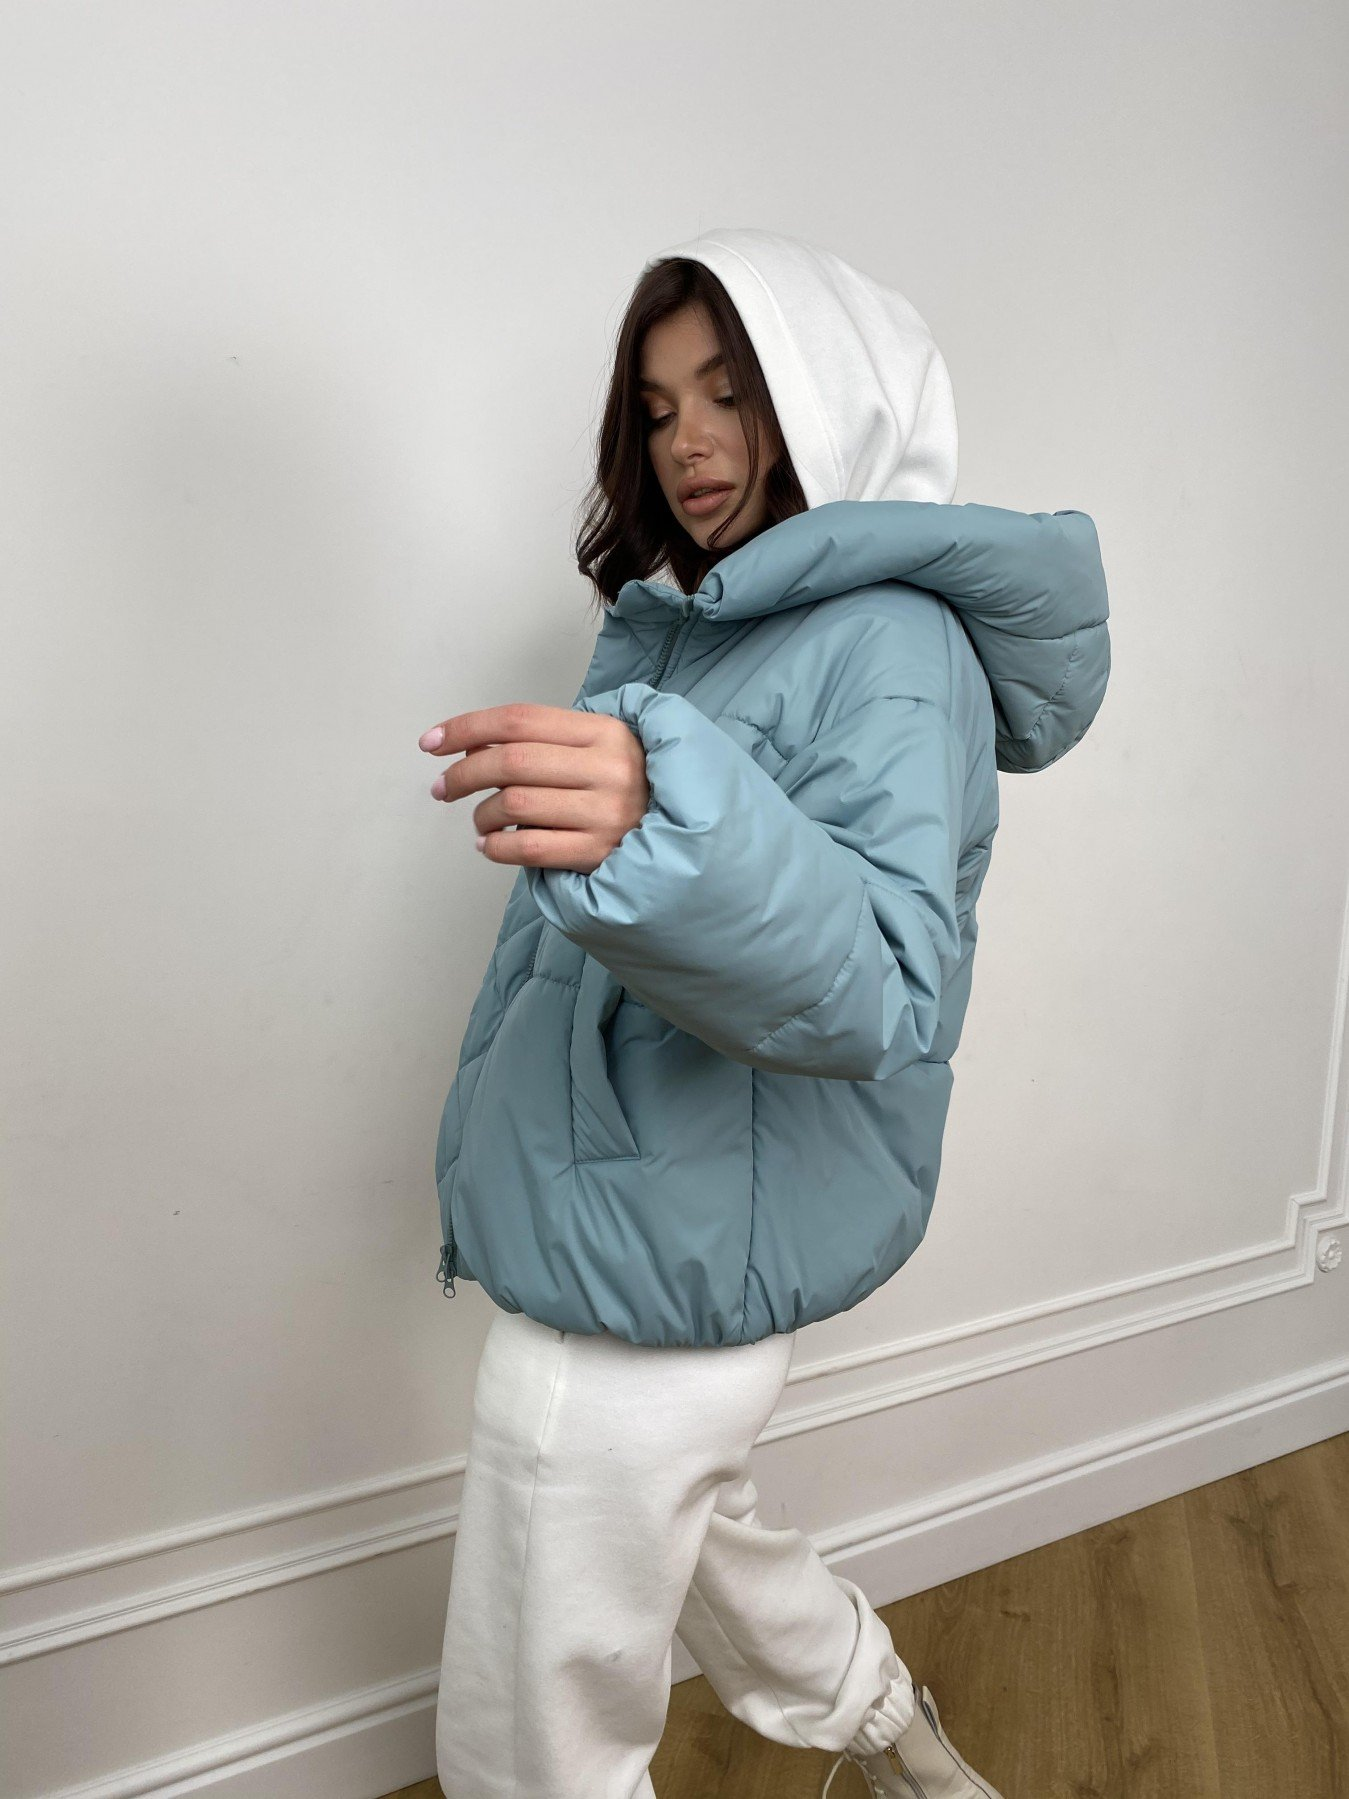 Нокс куртка  из плащевой ткани Astra 10994 АРТ. 47484 Цвет: Олива Astra - фото 6, интернет магазин tm-modus.ru